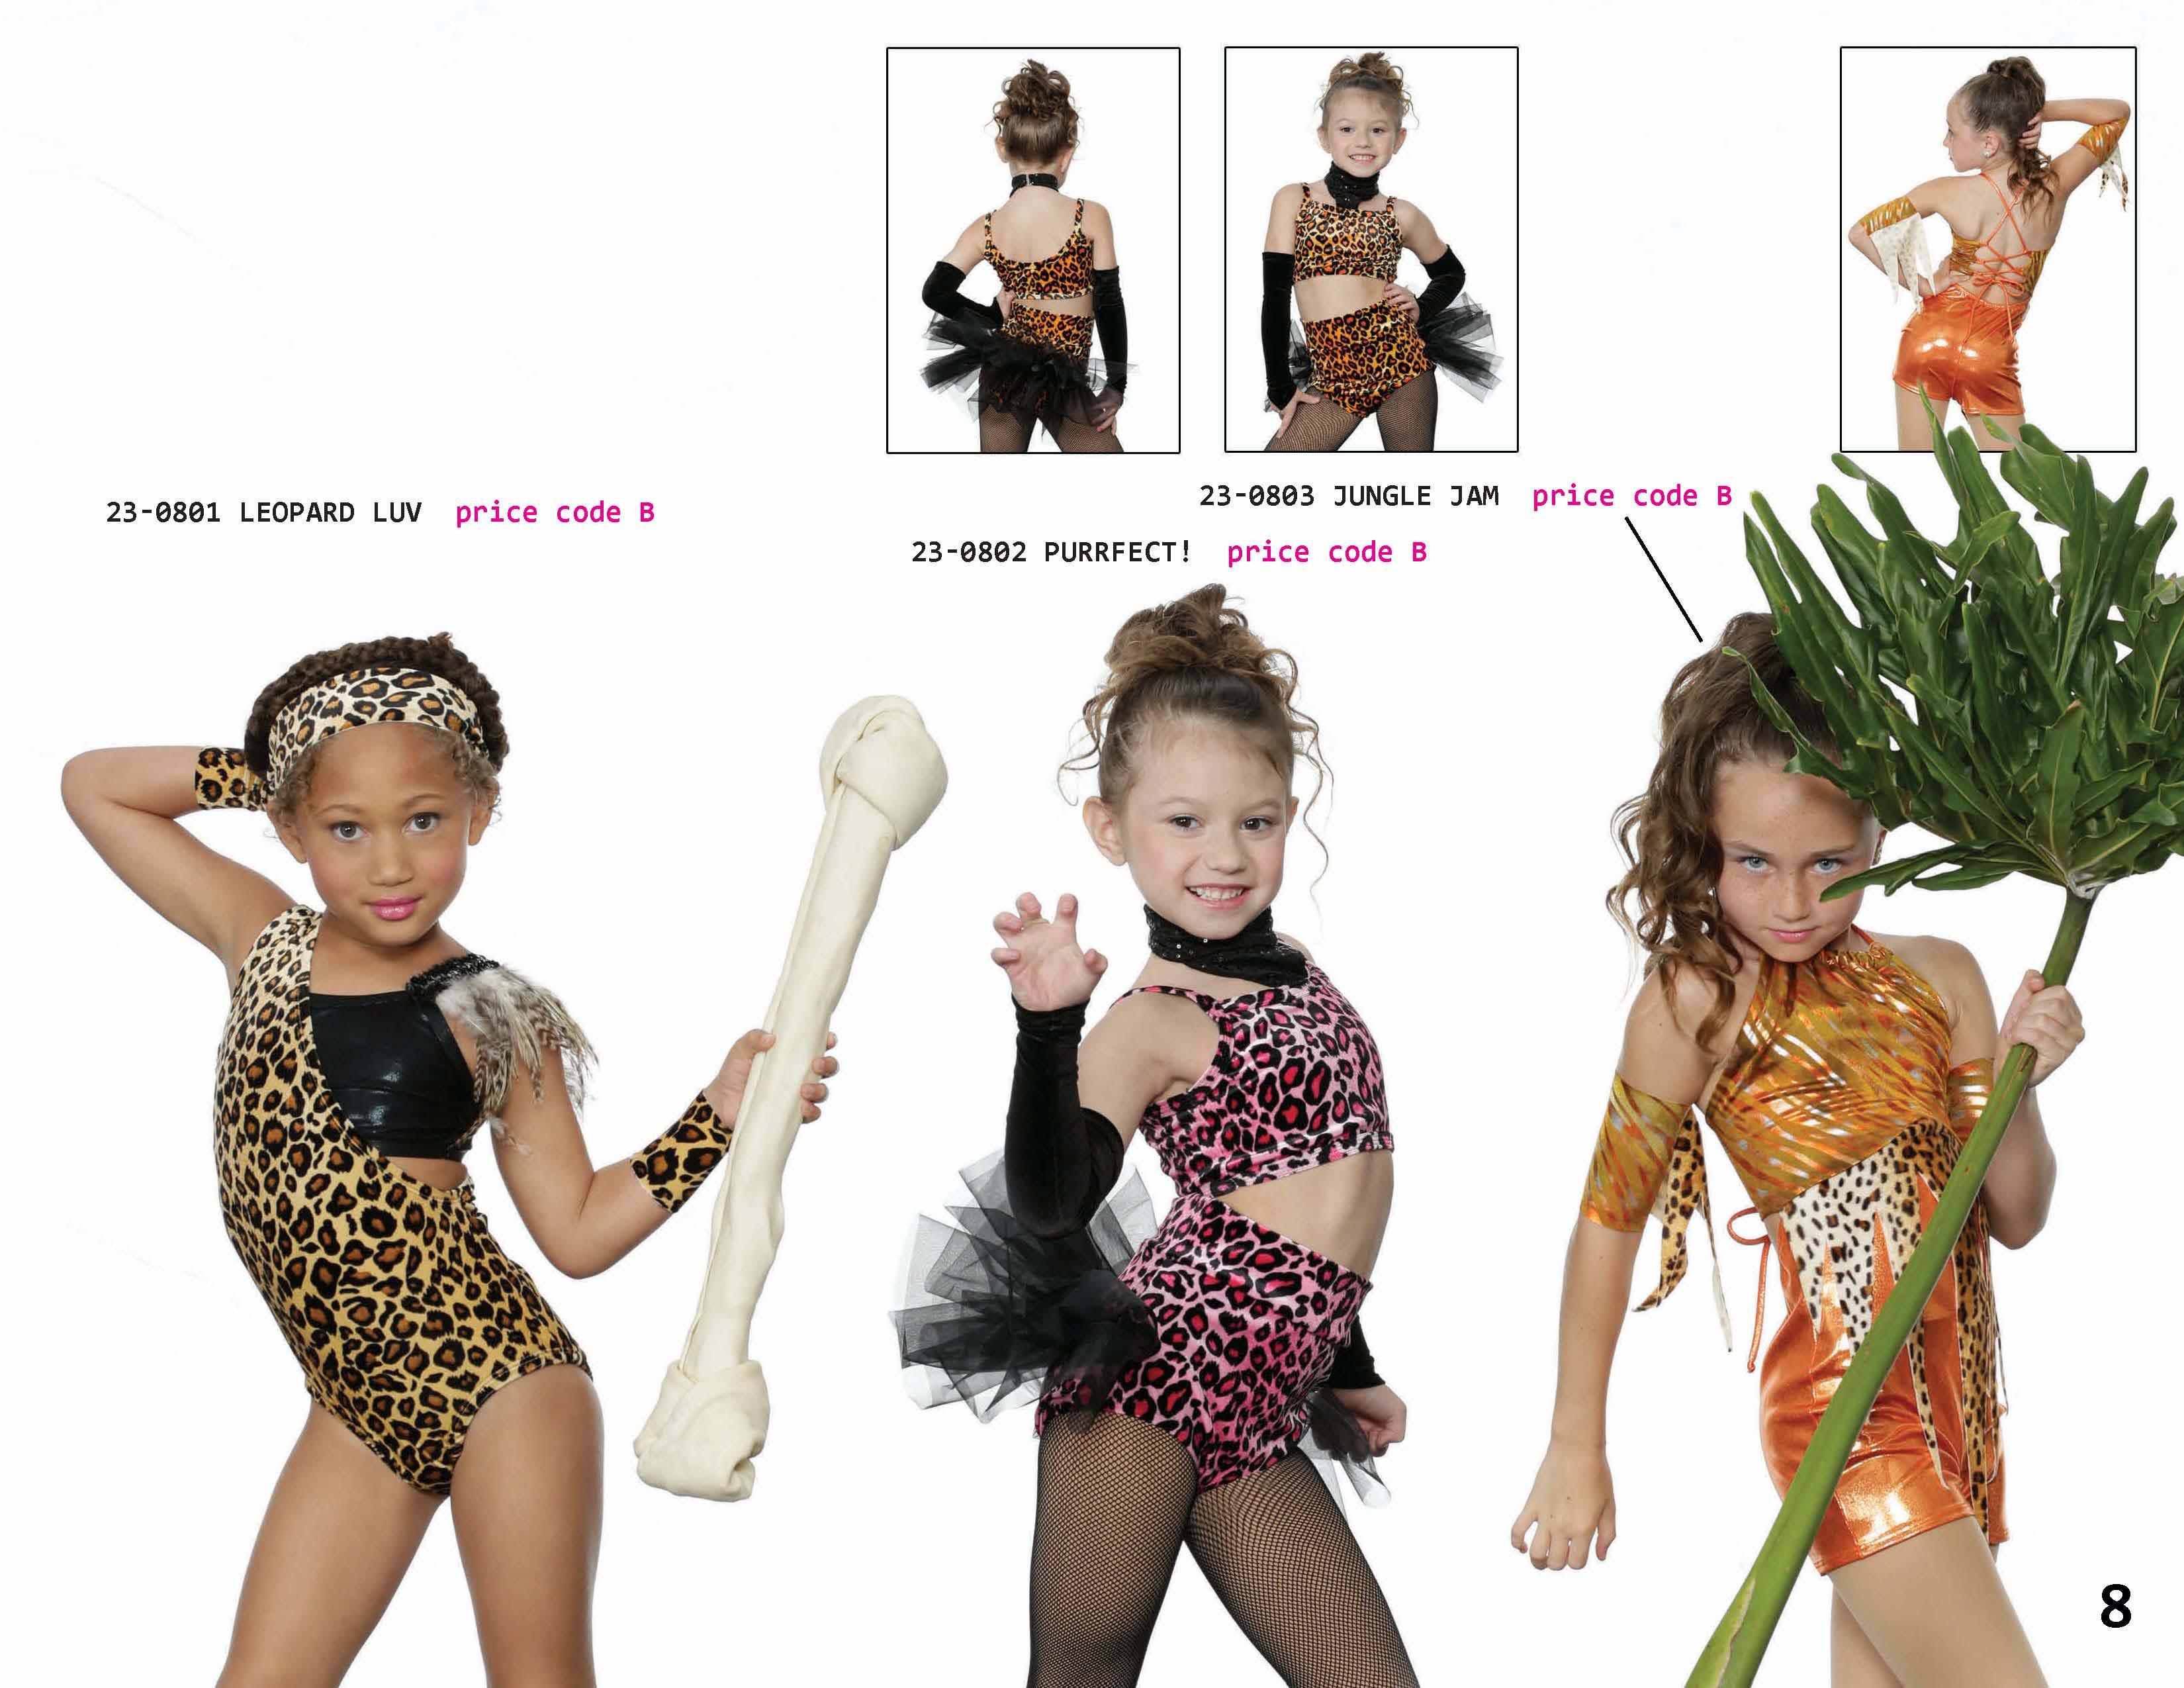 206c720e7 Georgie Girl - Dance Costumes - Catalog 2016